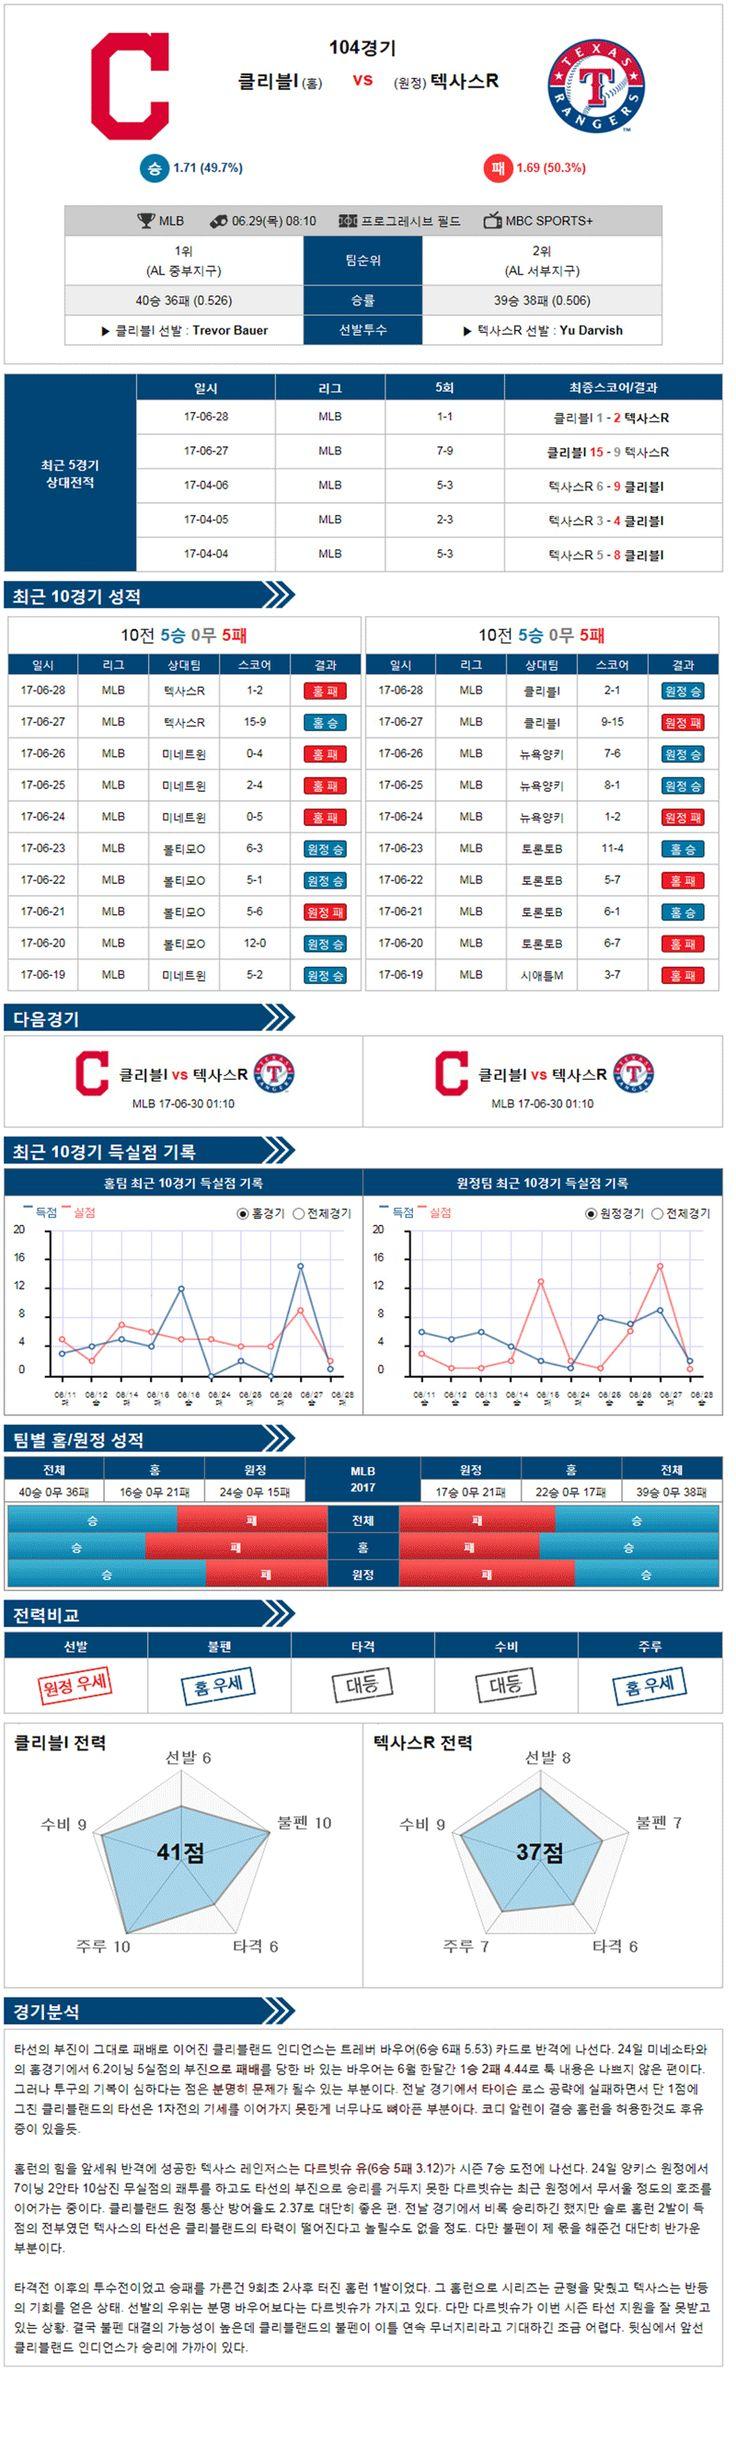 [MLB] 6월 29일 야구분석픽 클리블랜드 VS 텍사스 ★토토군 분석픽★